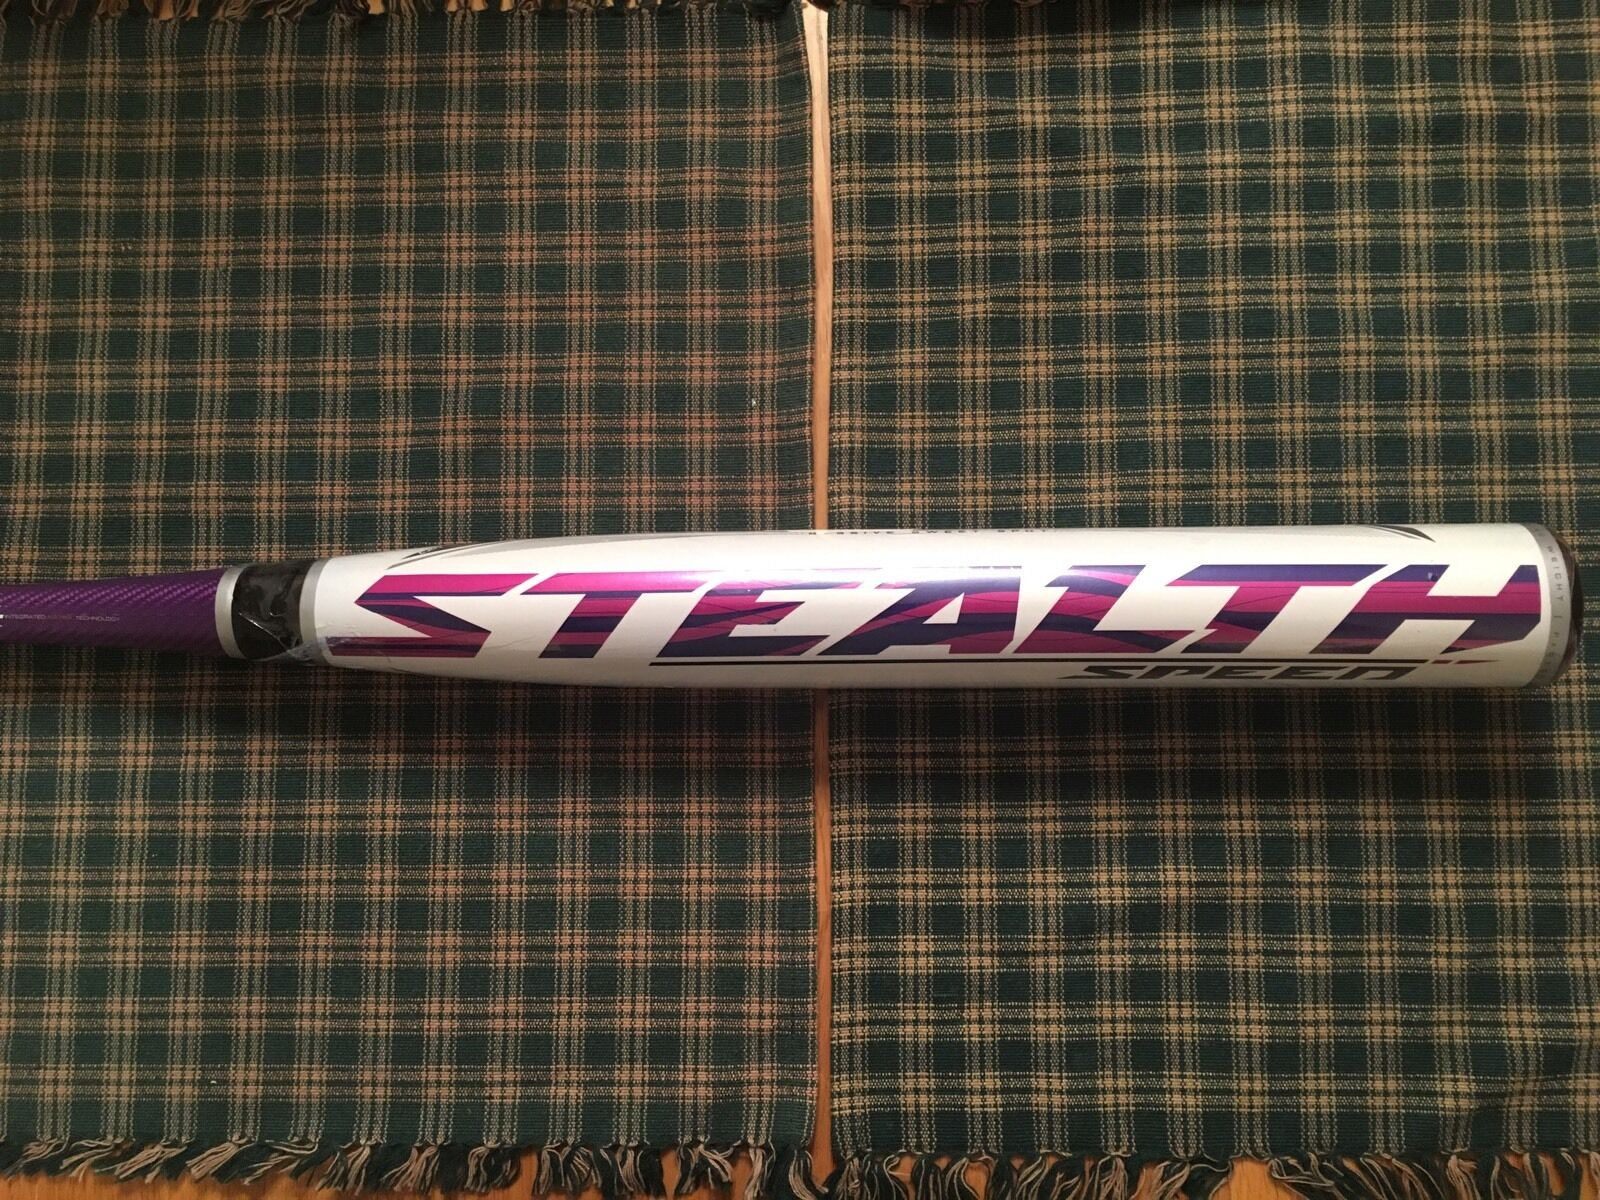 *RARE* NIW OG Easton Stealth Bat Speed SSR3B Fastpitch Softball Bat Stealth 33/23 ASA HOT!! faa64e